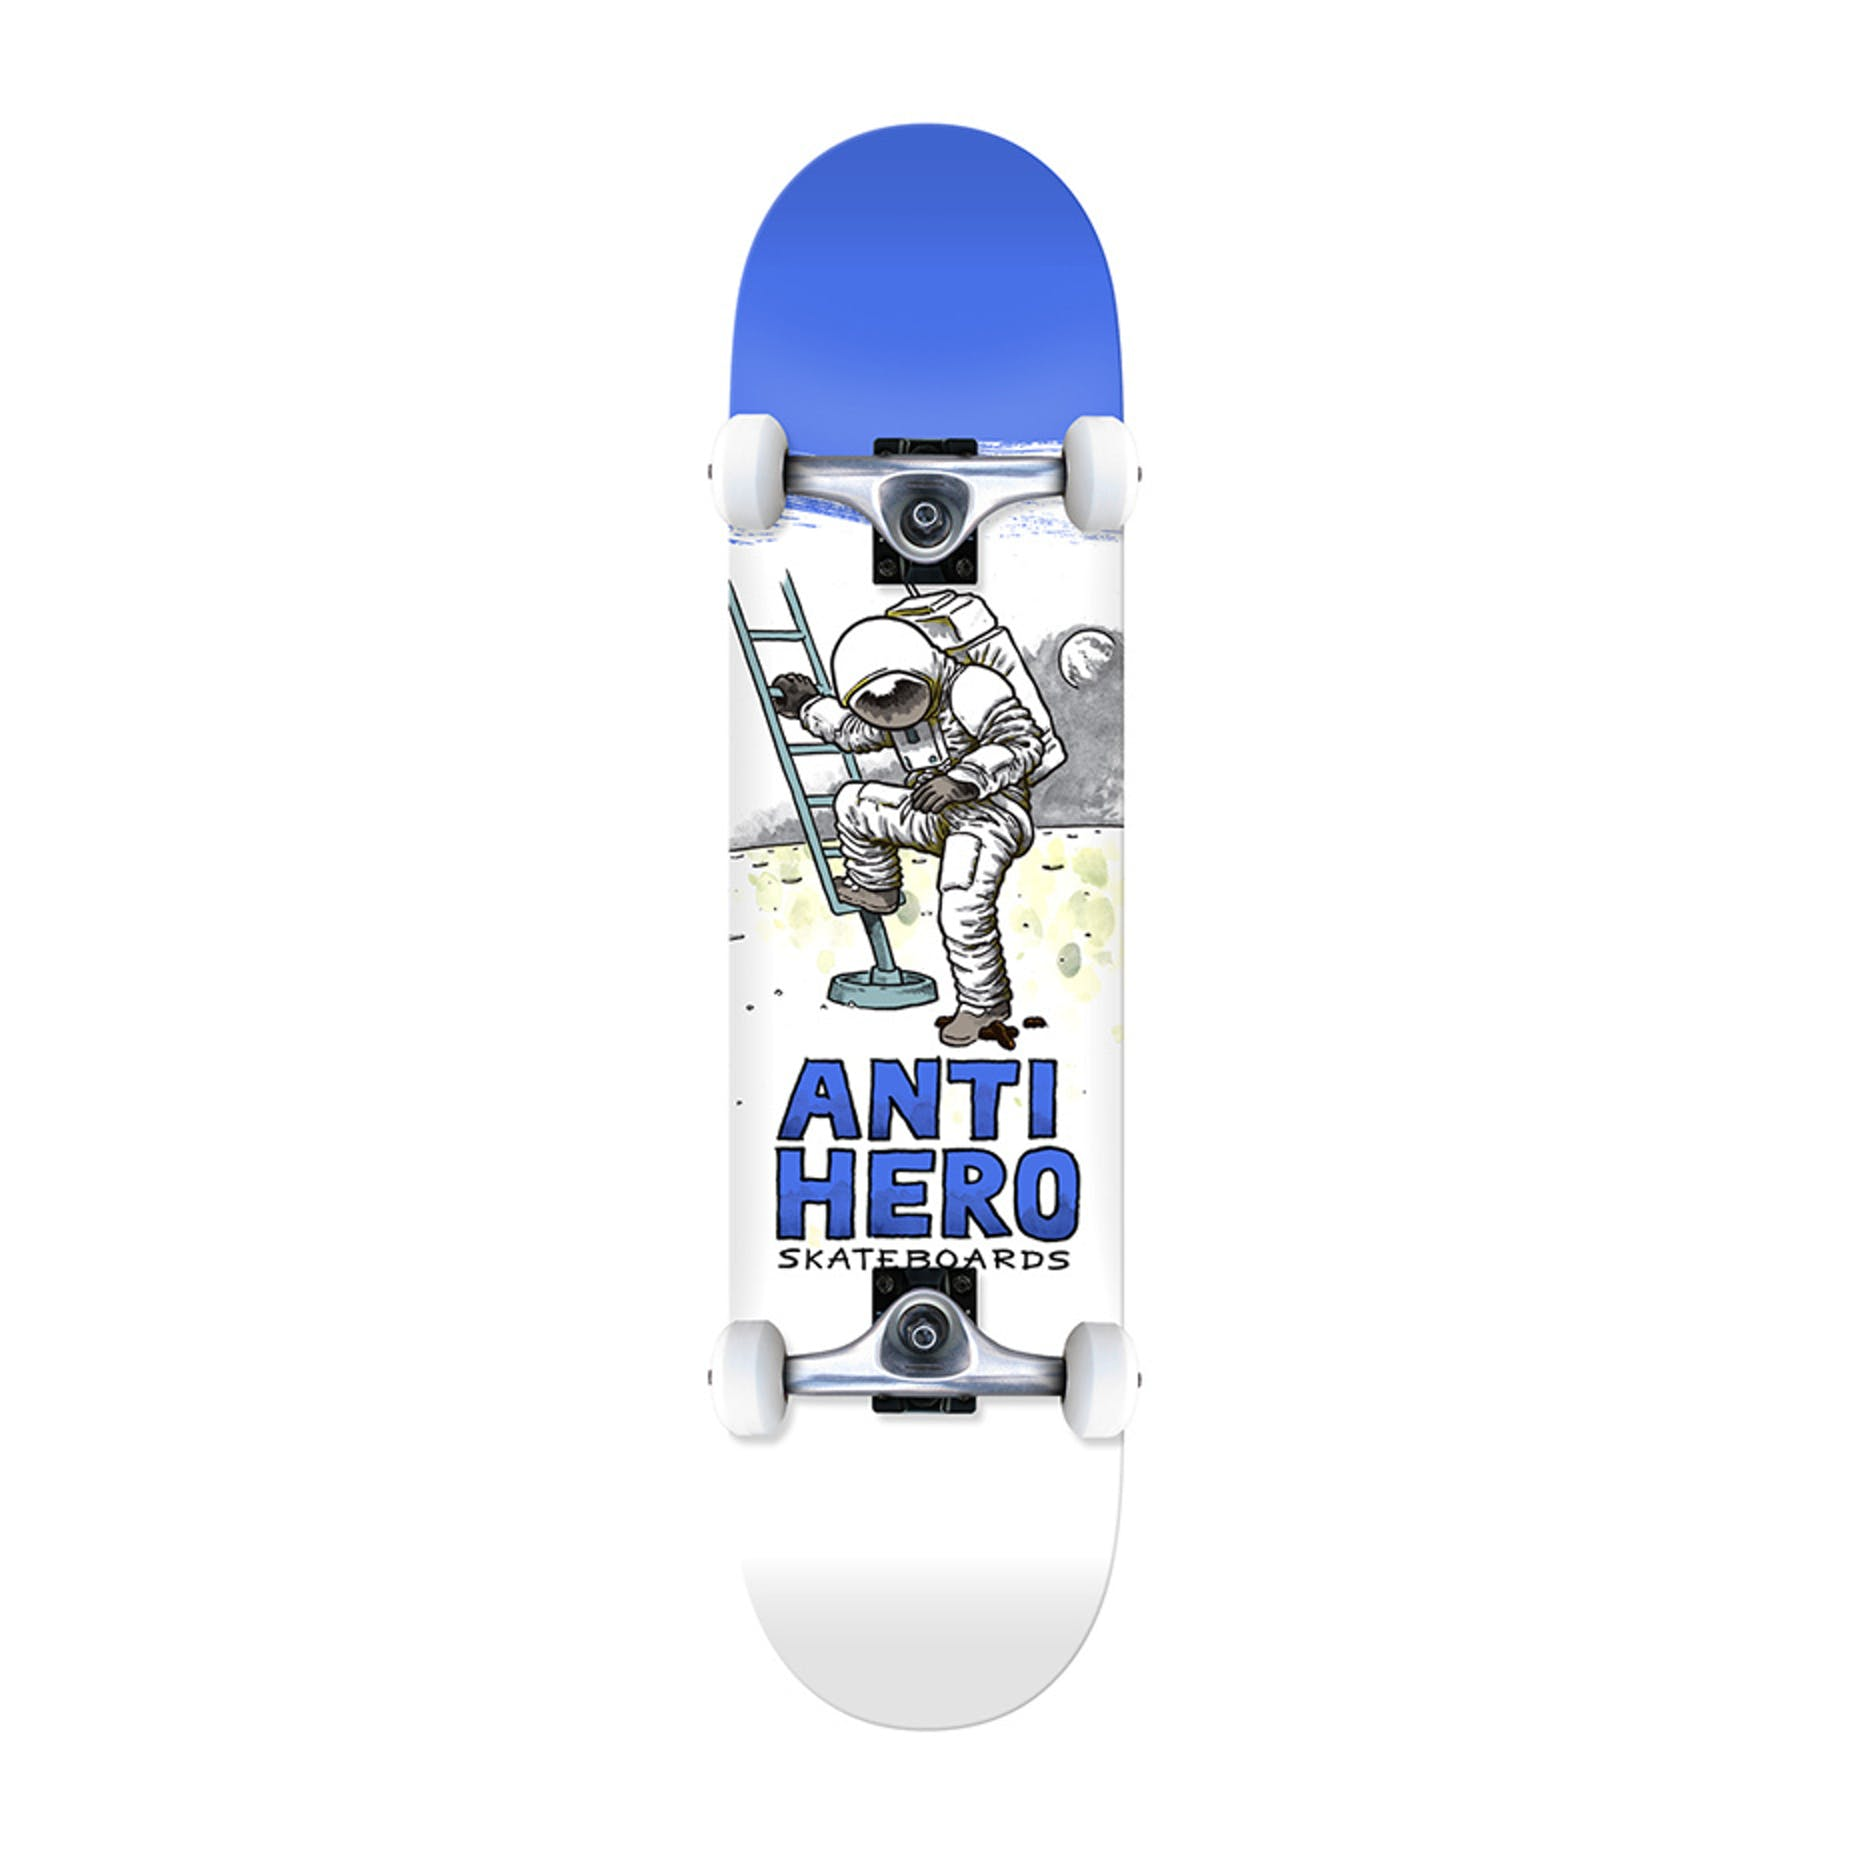 Antihero Moon Landing 775 Complete Skateboard Blue